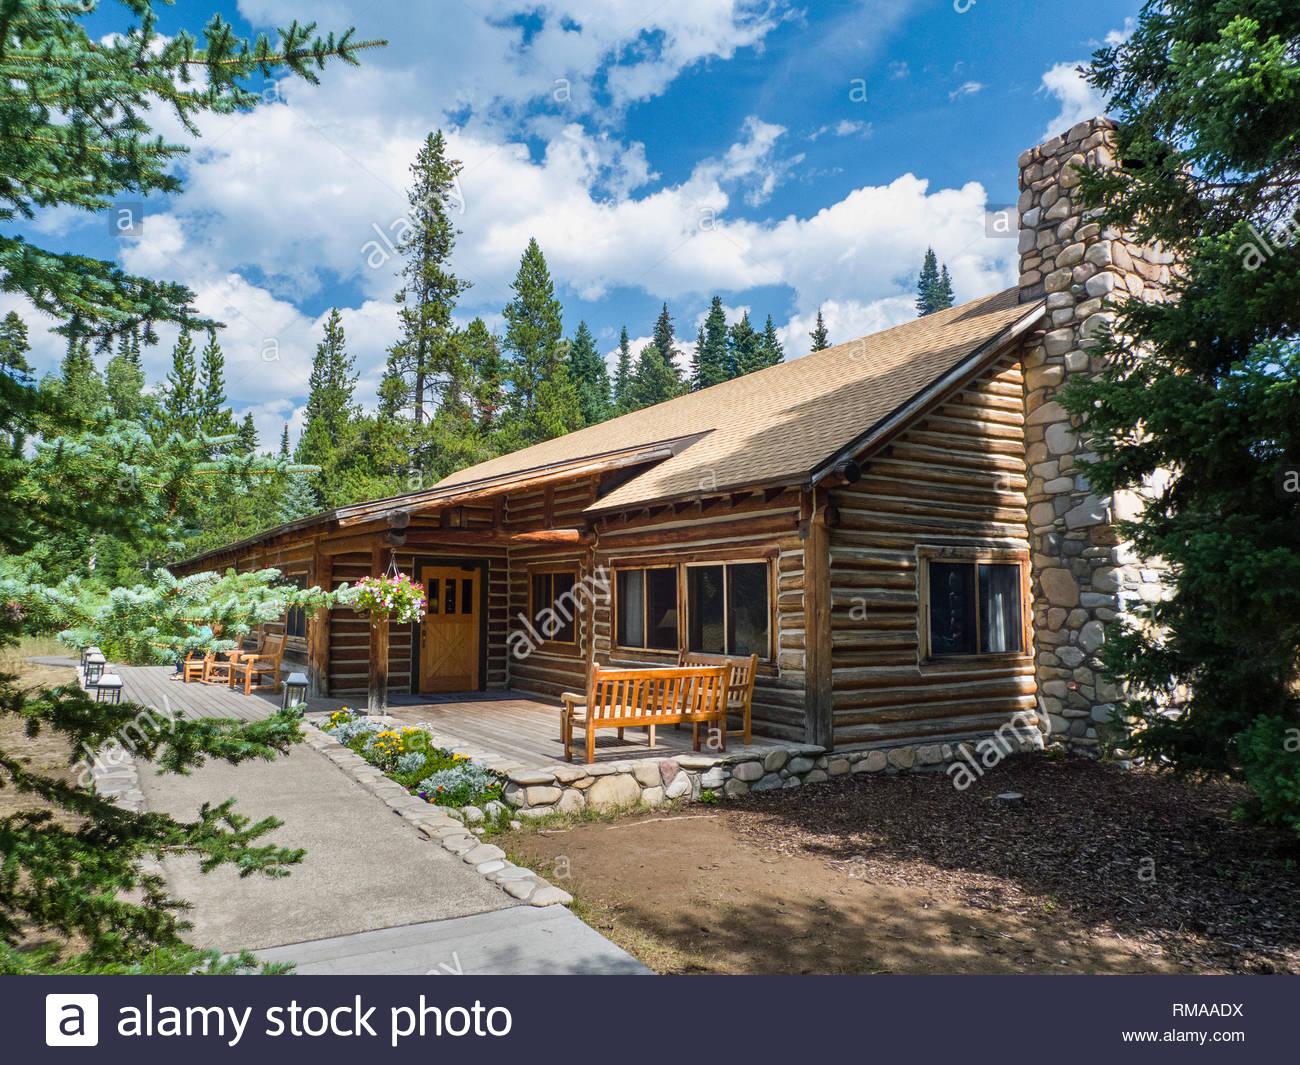 Jenny Lake Lodge Grand Teton National Park Teton County Wyoming Usa Stock Photo Alamy